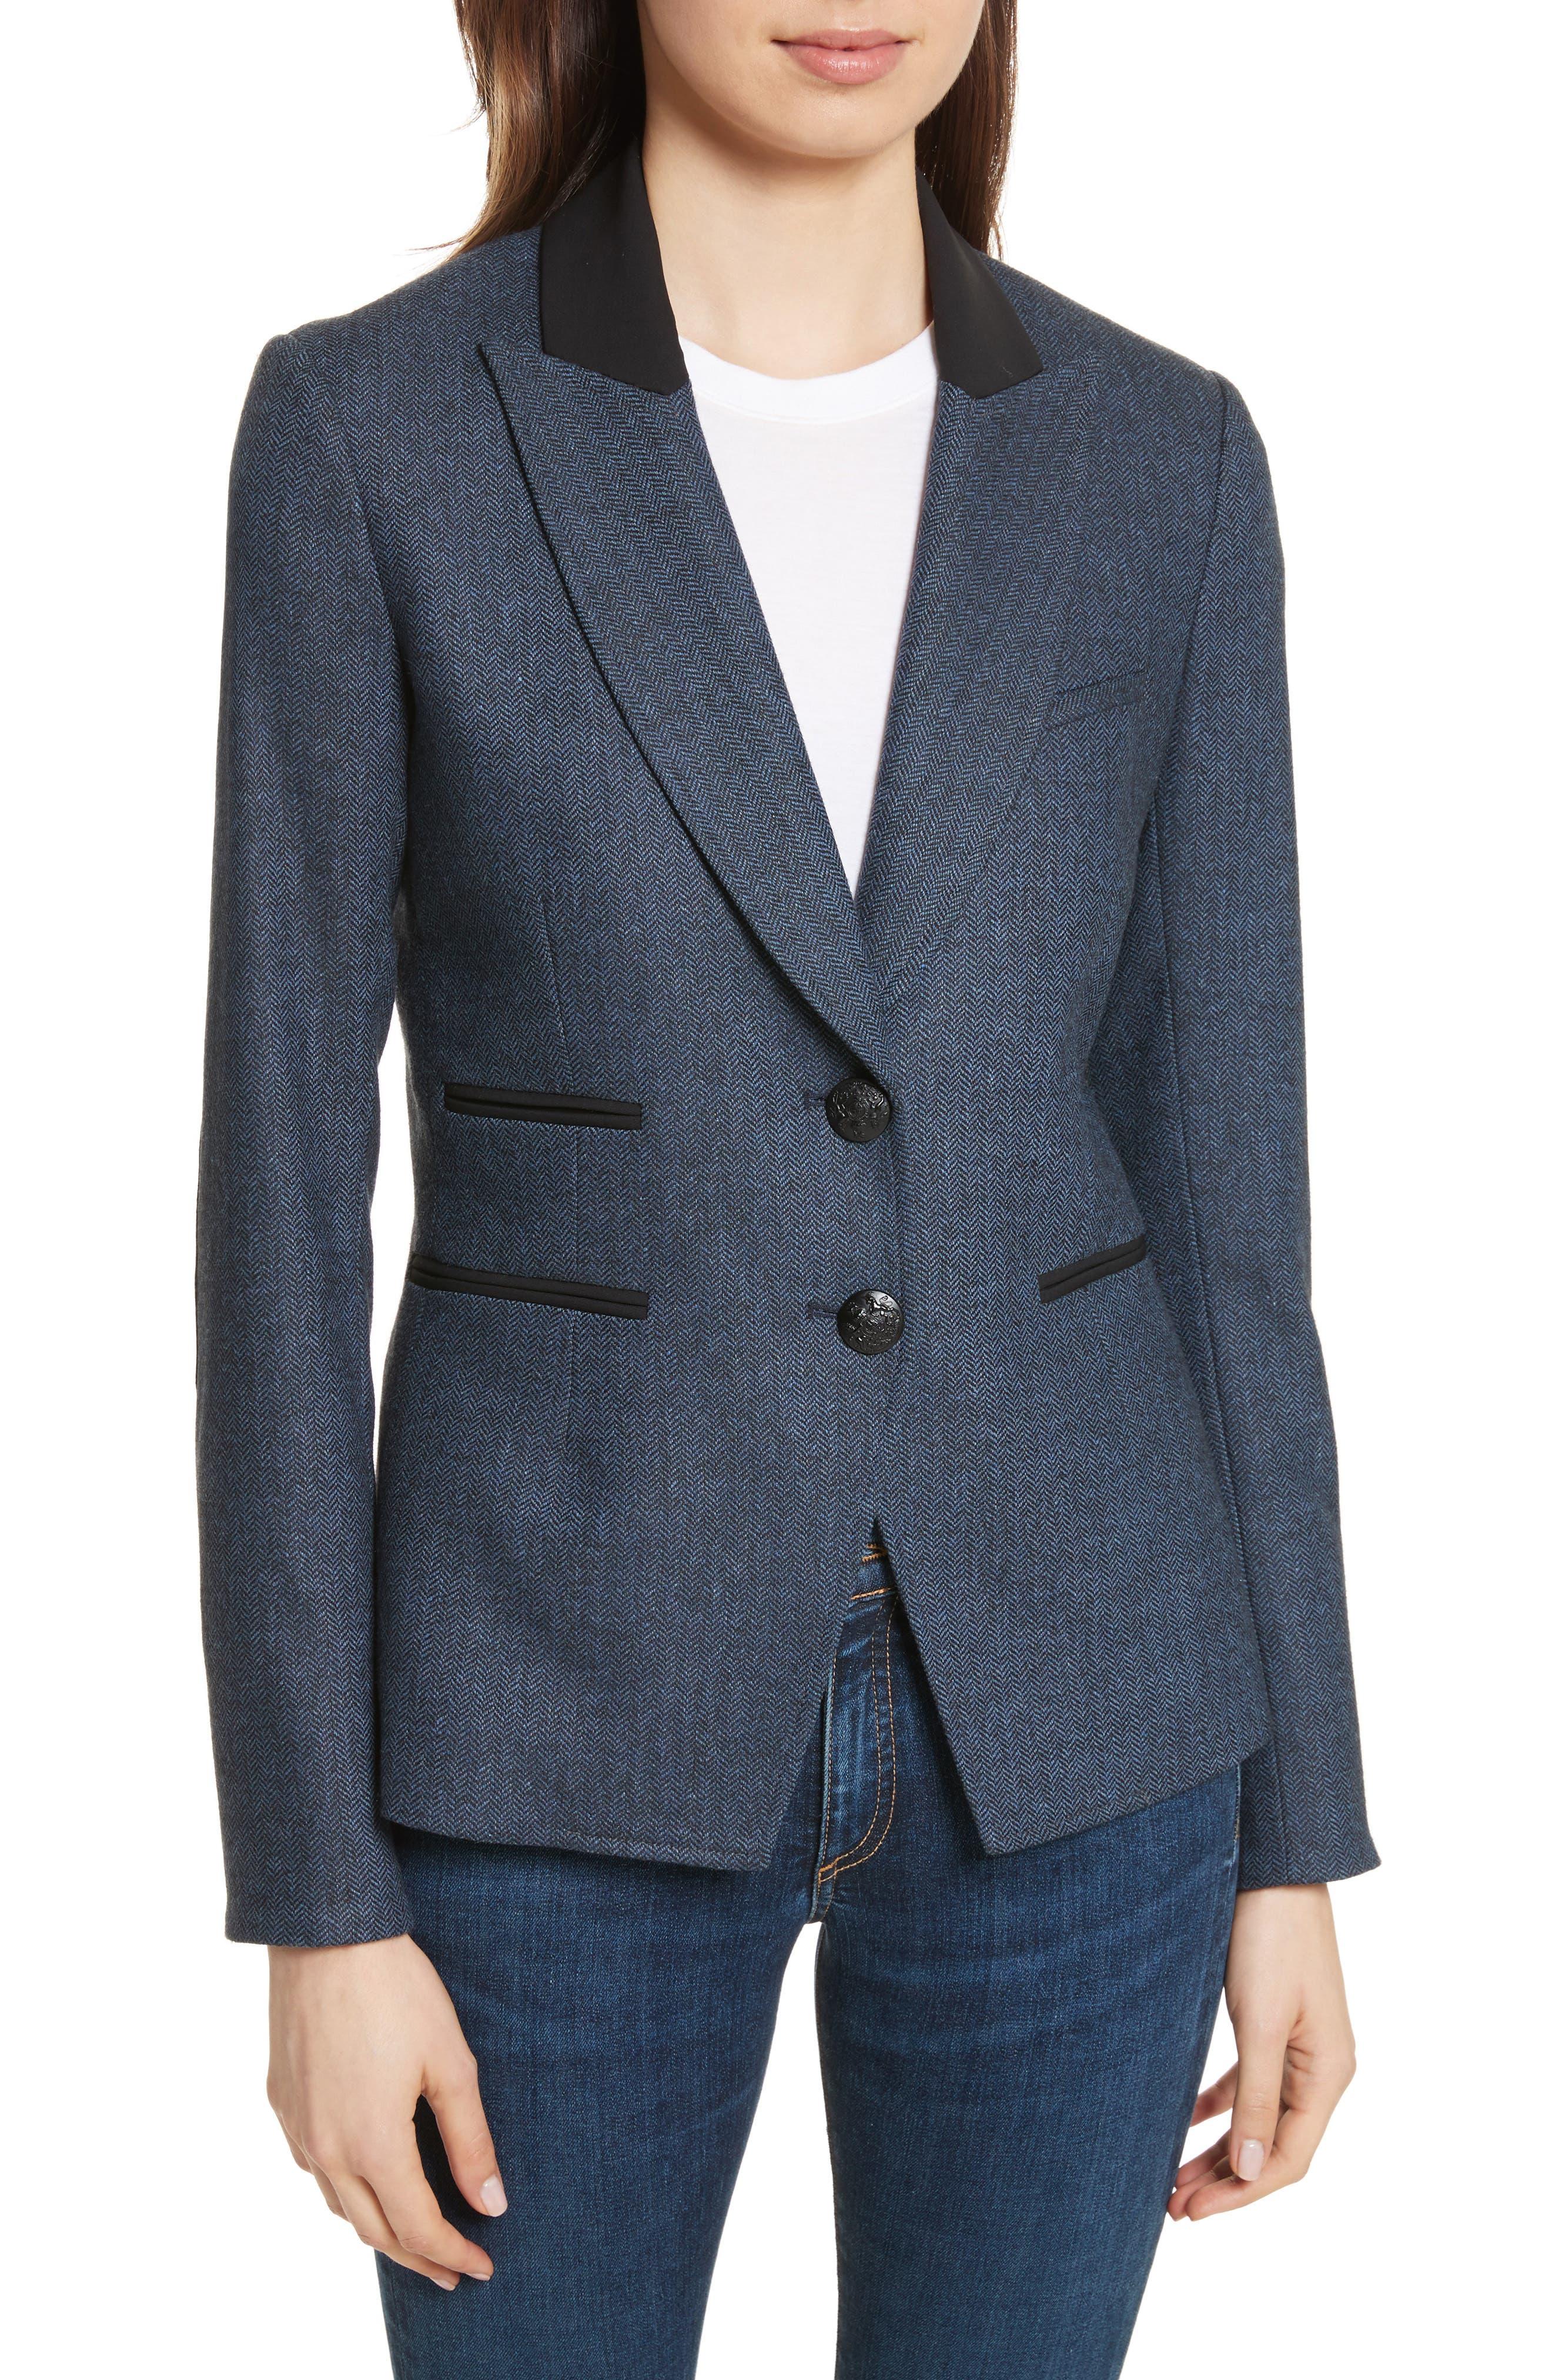 Alternate Image 1 Selected - Veronica Beard Hudson Jacket